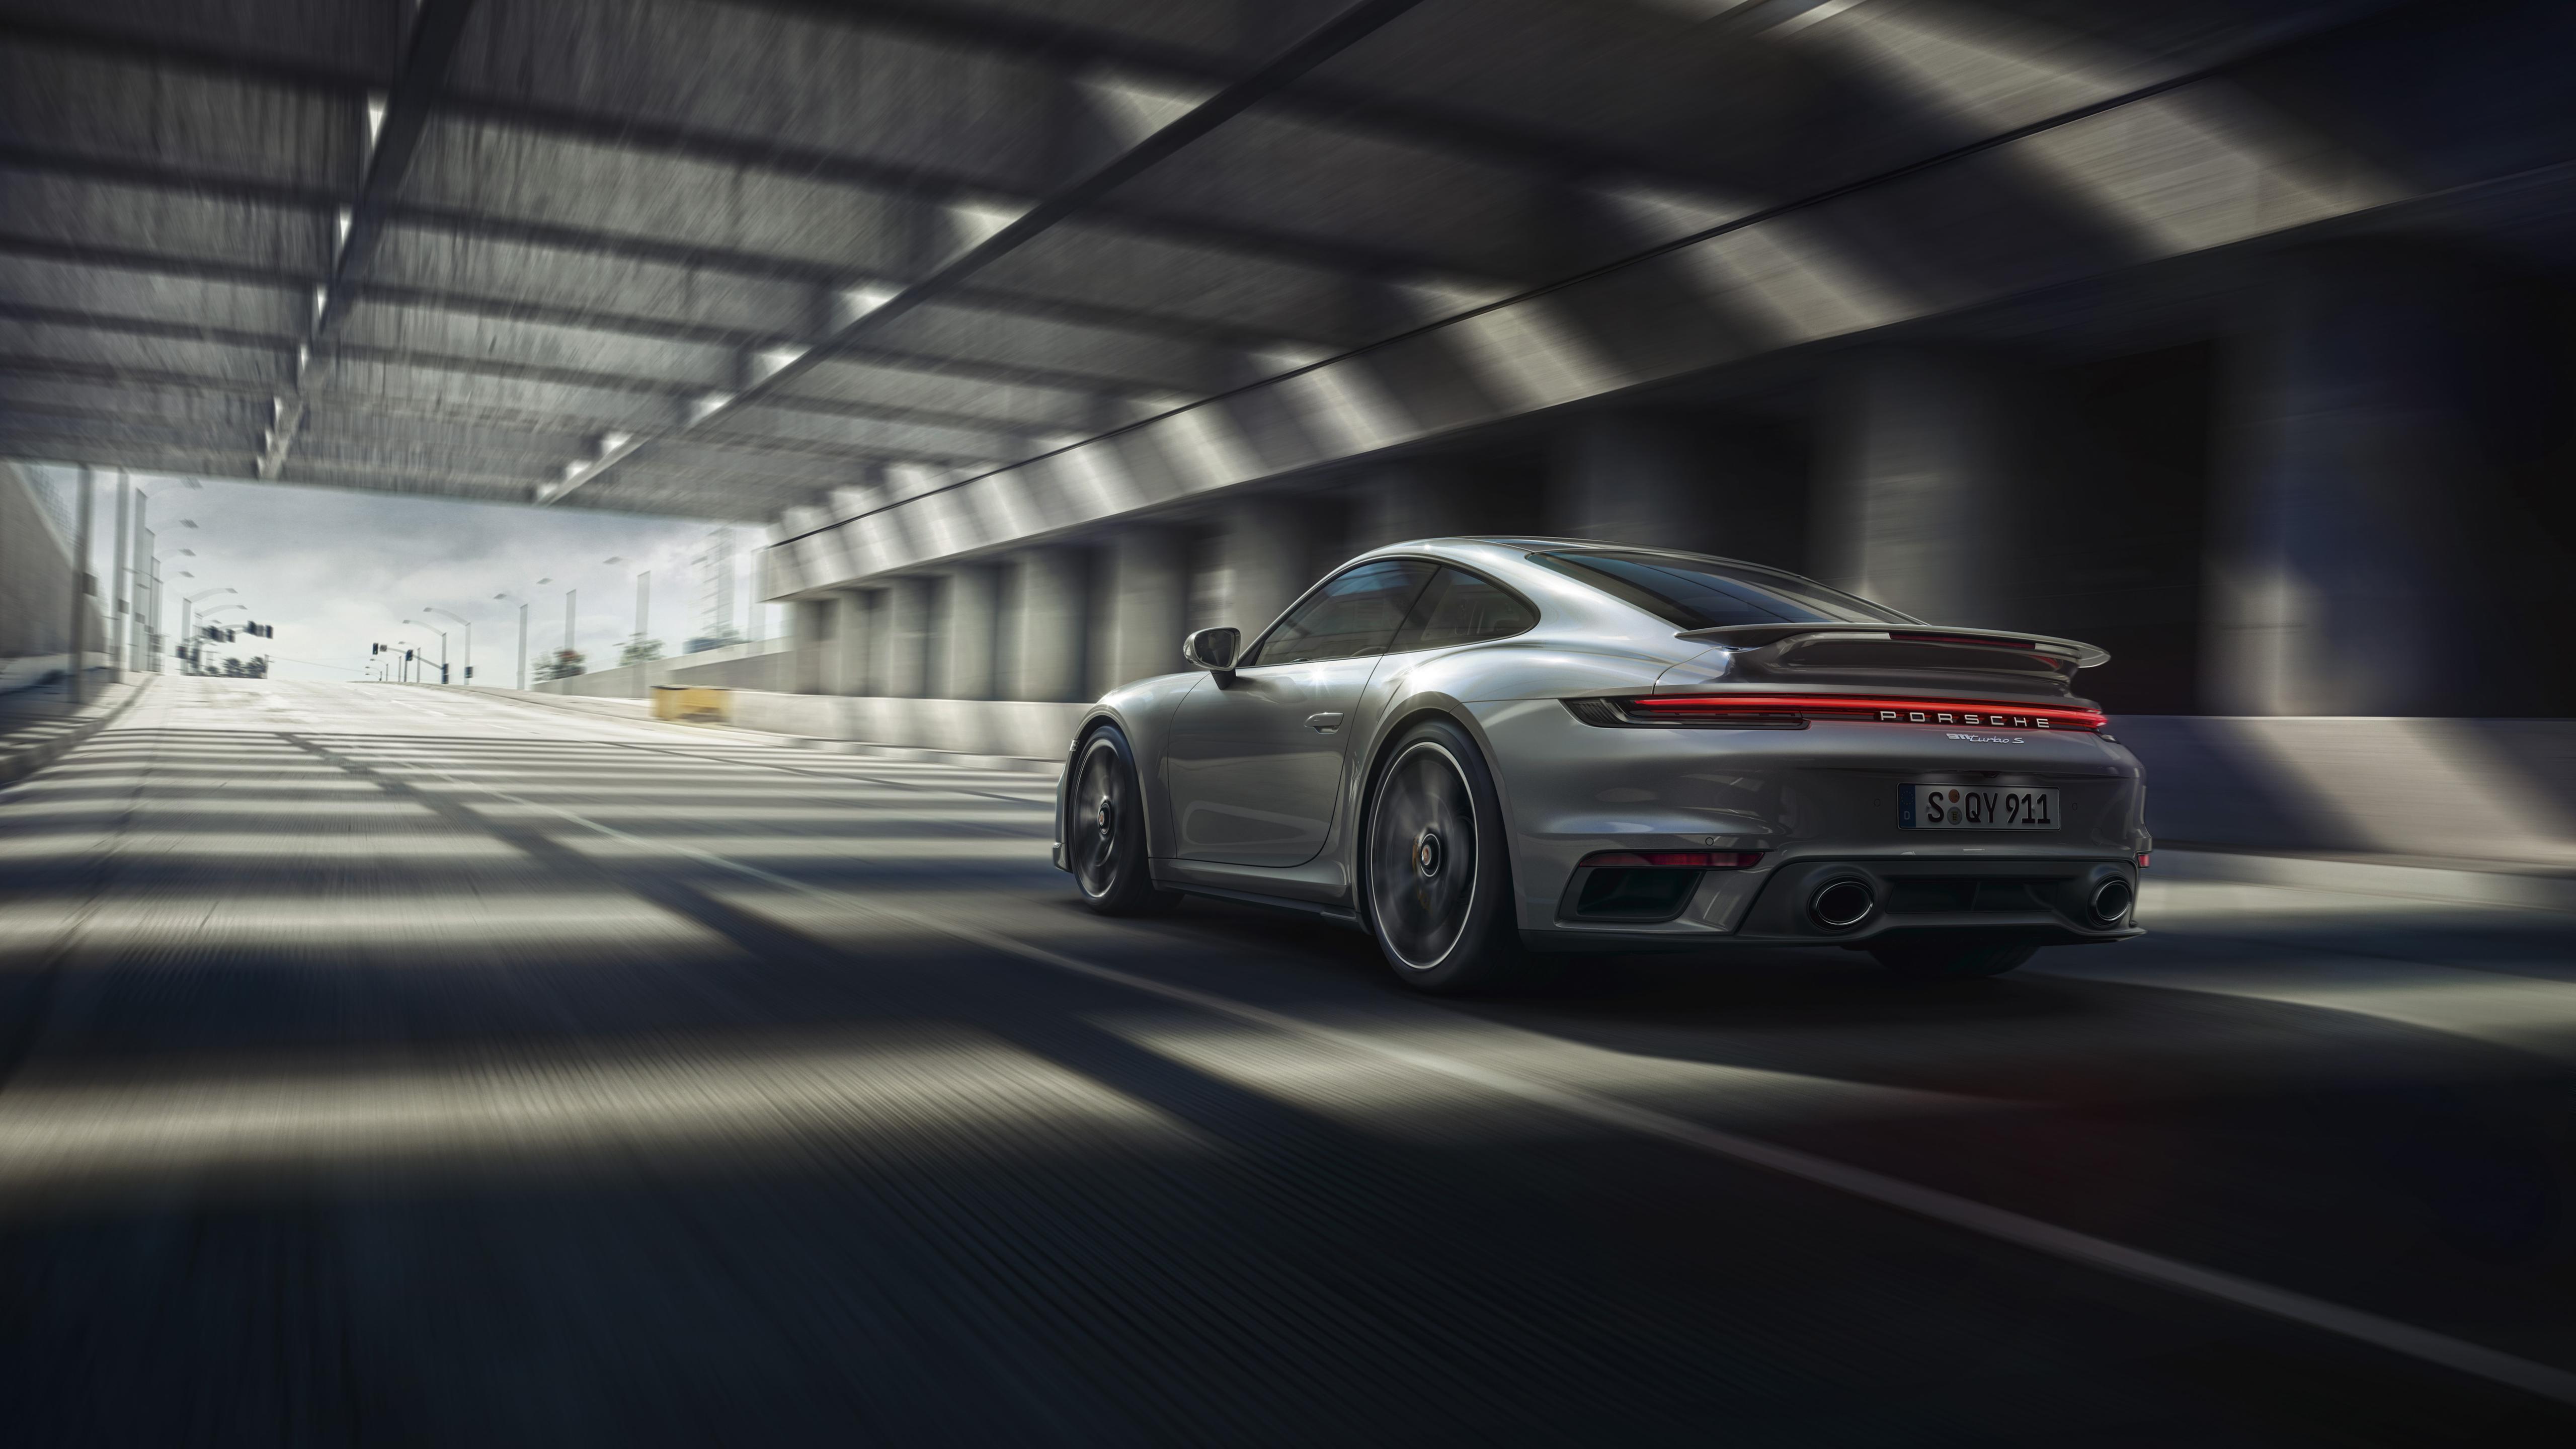 Porsche 911 Turbo S 2020 5K 4 Wallpaper HD Car Wallpapers ID 5120x2880